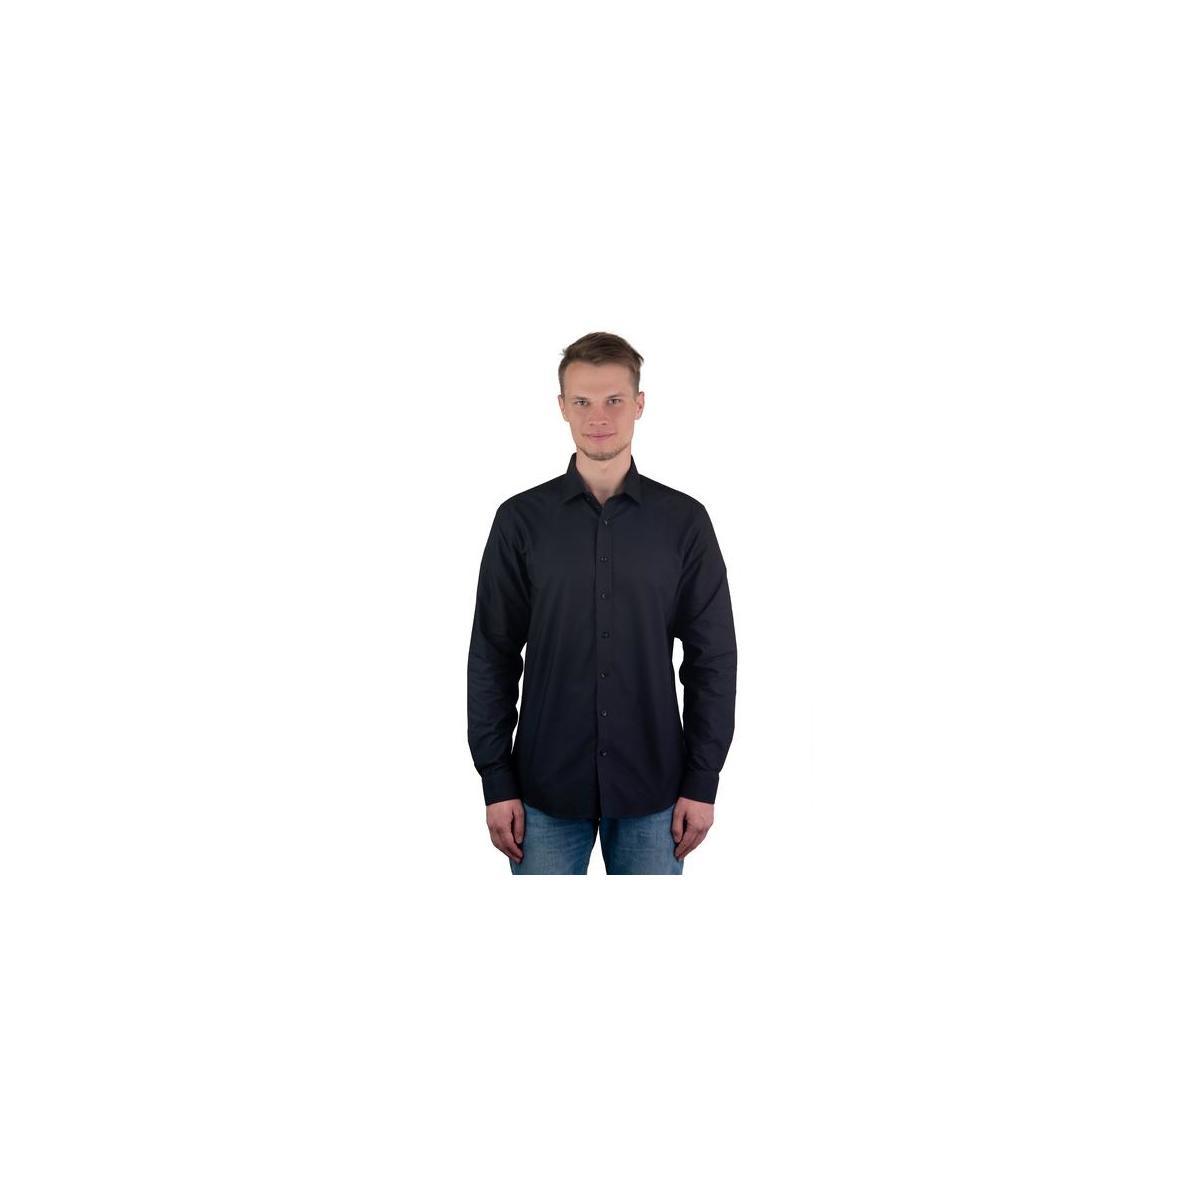 Mens Dress Shirts - Long Sleeve Formal Shirt - Casual Shirt - Oxford 100% Cotton